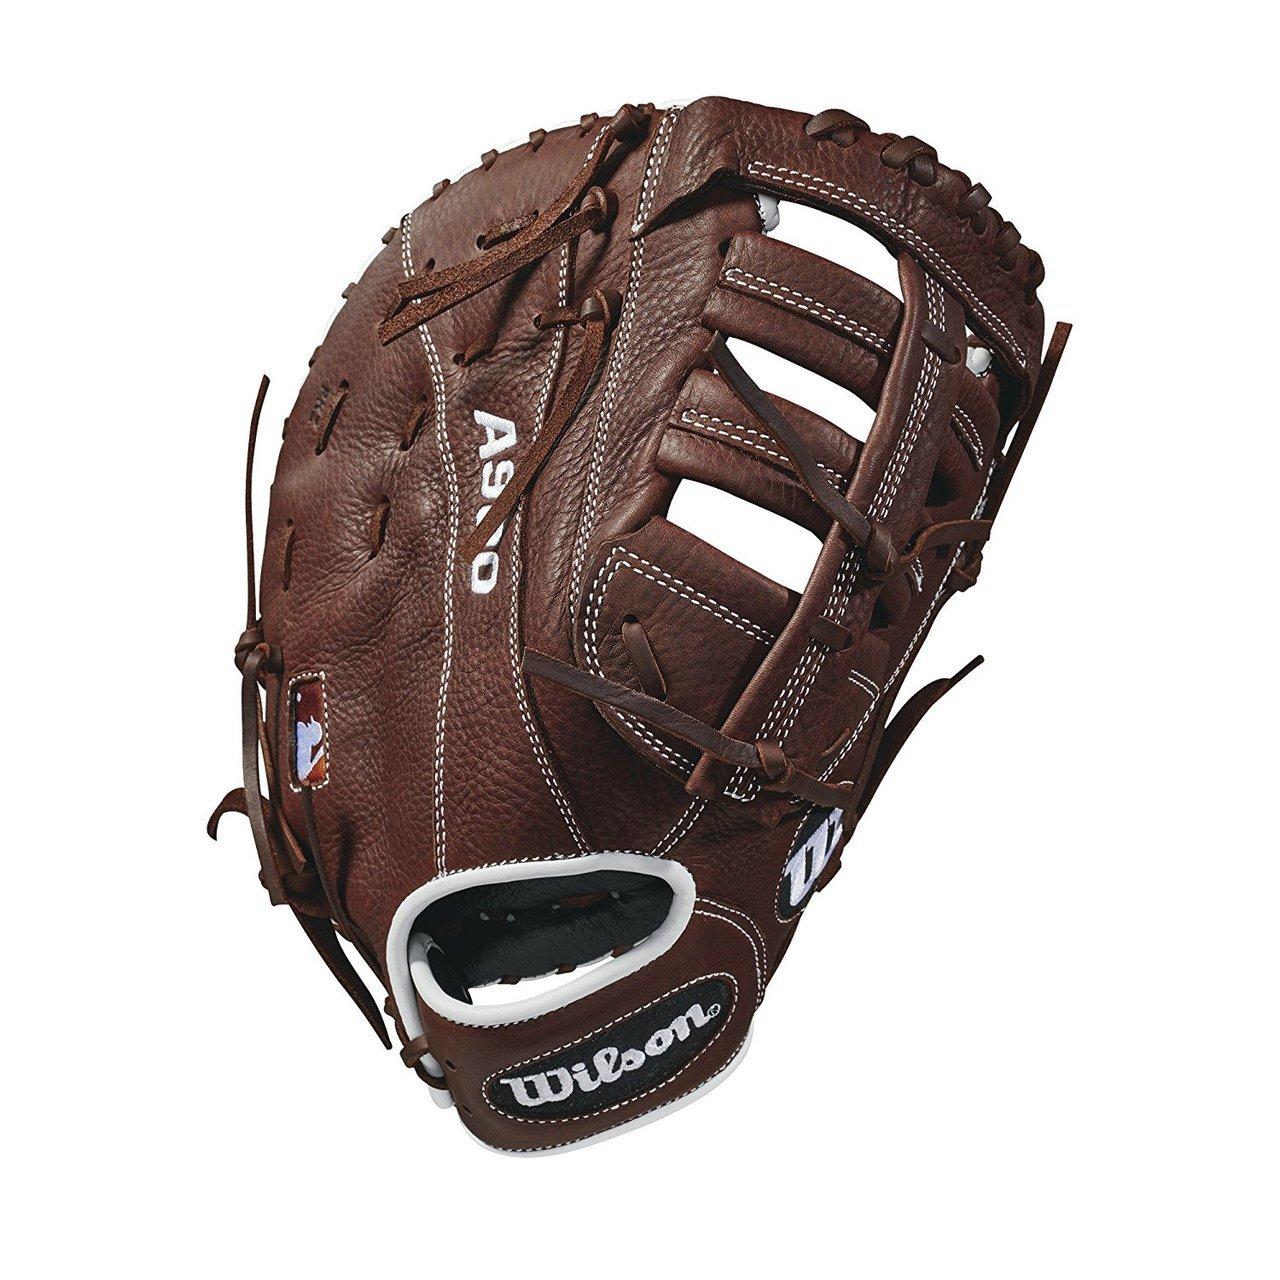 wilson baseball glove wta09rb18bm12